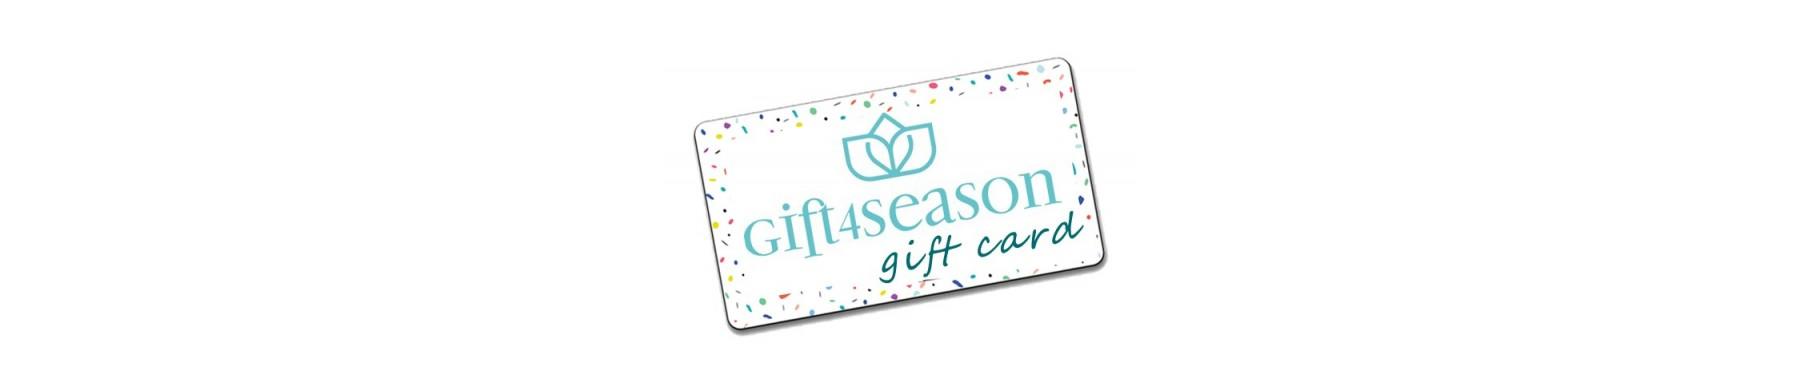 Gift Card Gift4season